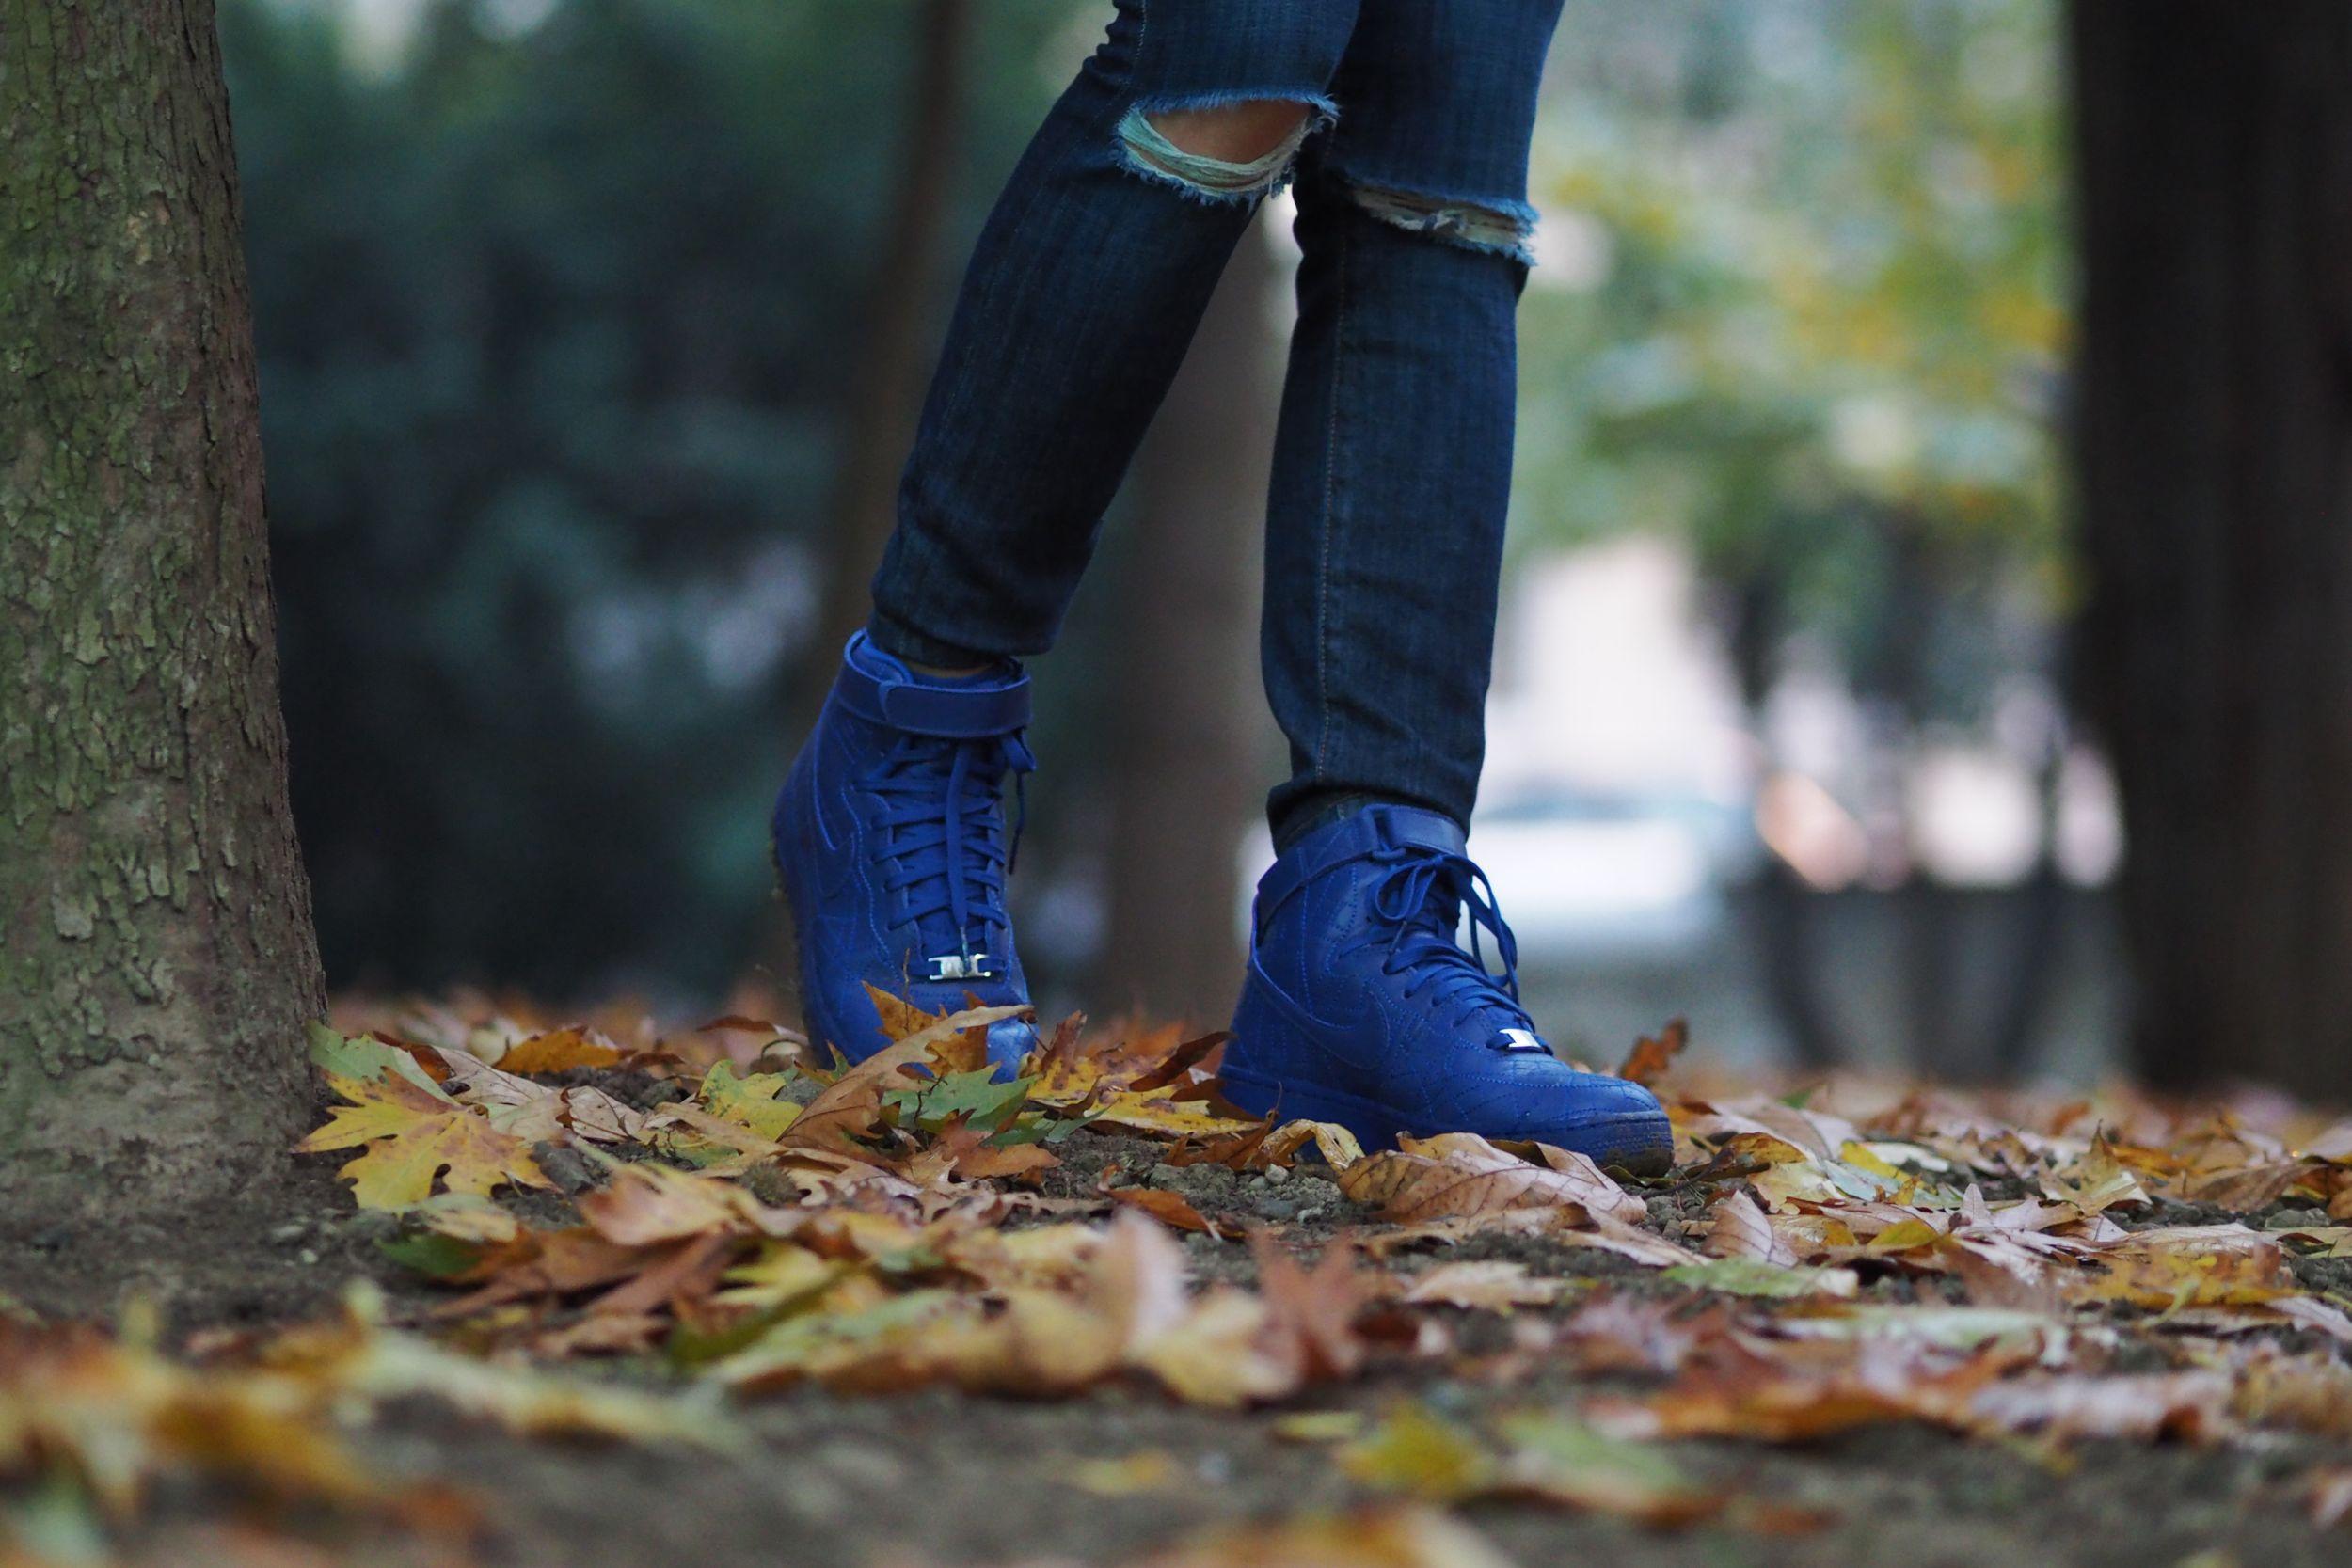 cashmireinlove, autumn, sonbahar, street style, off ne giysem, billur saatci, nike air force, city pack, paris edition, super sunglasses, cos, antoine et lili, current/elliott